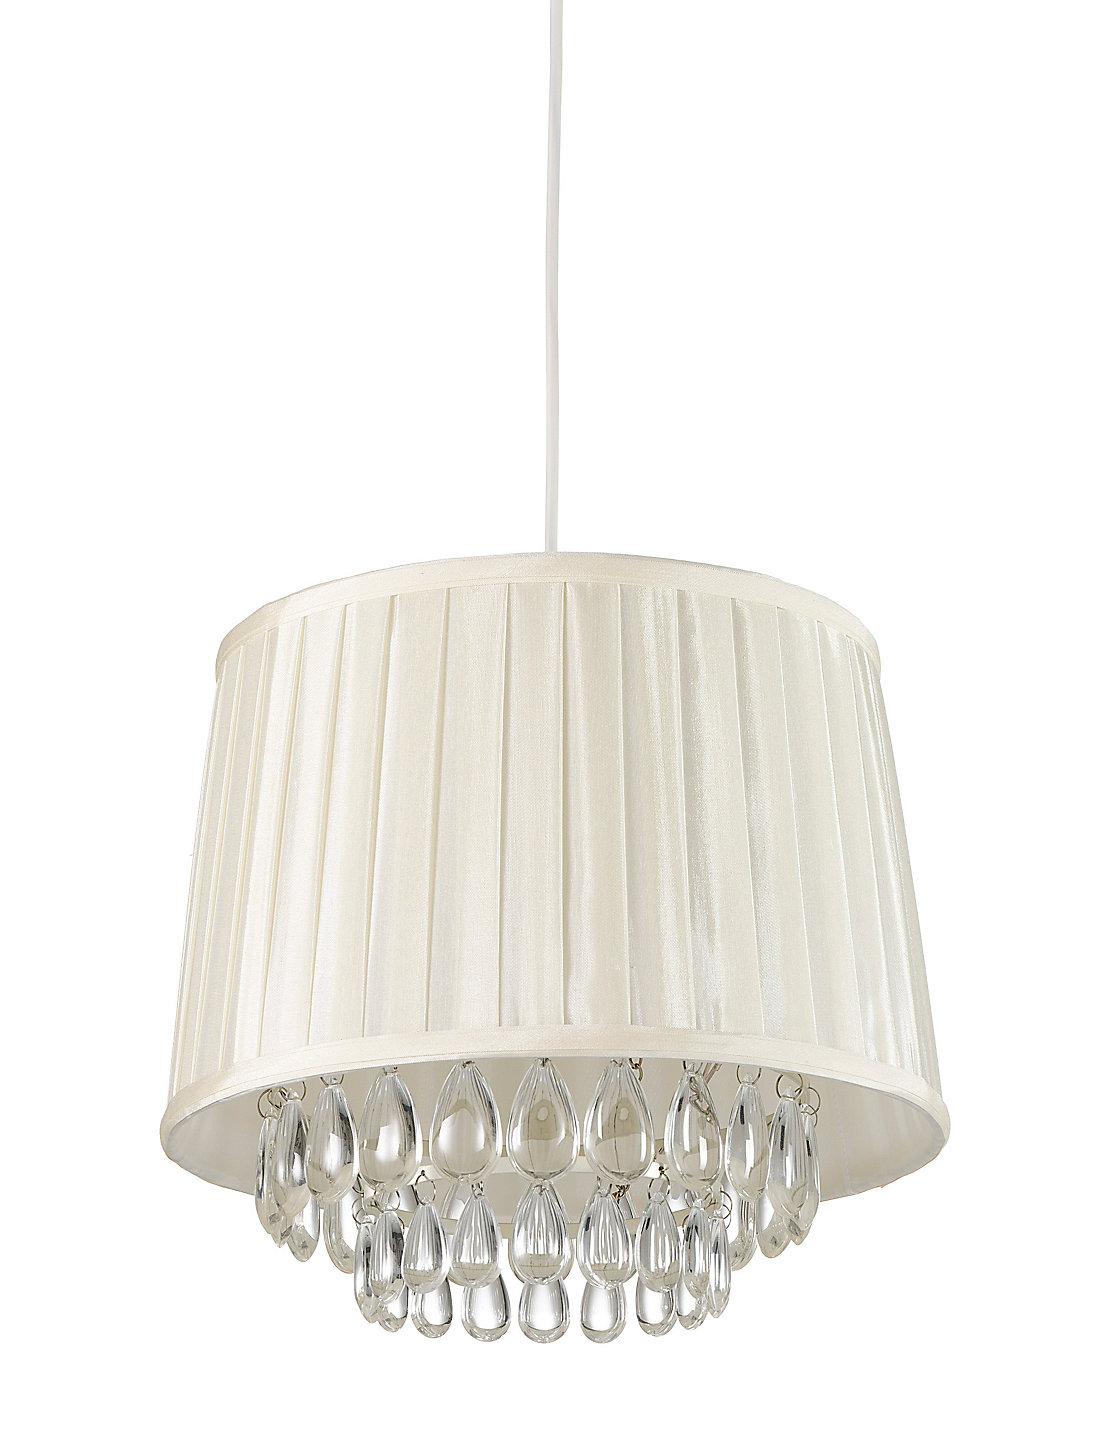 porcelain lighting. priscilla shade porcelain lighting n